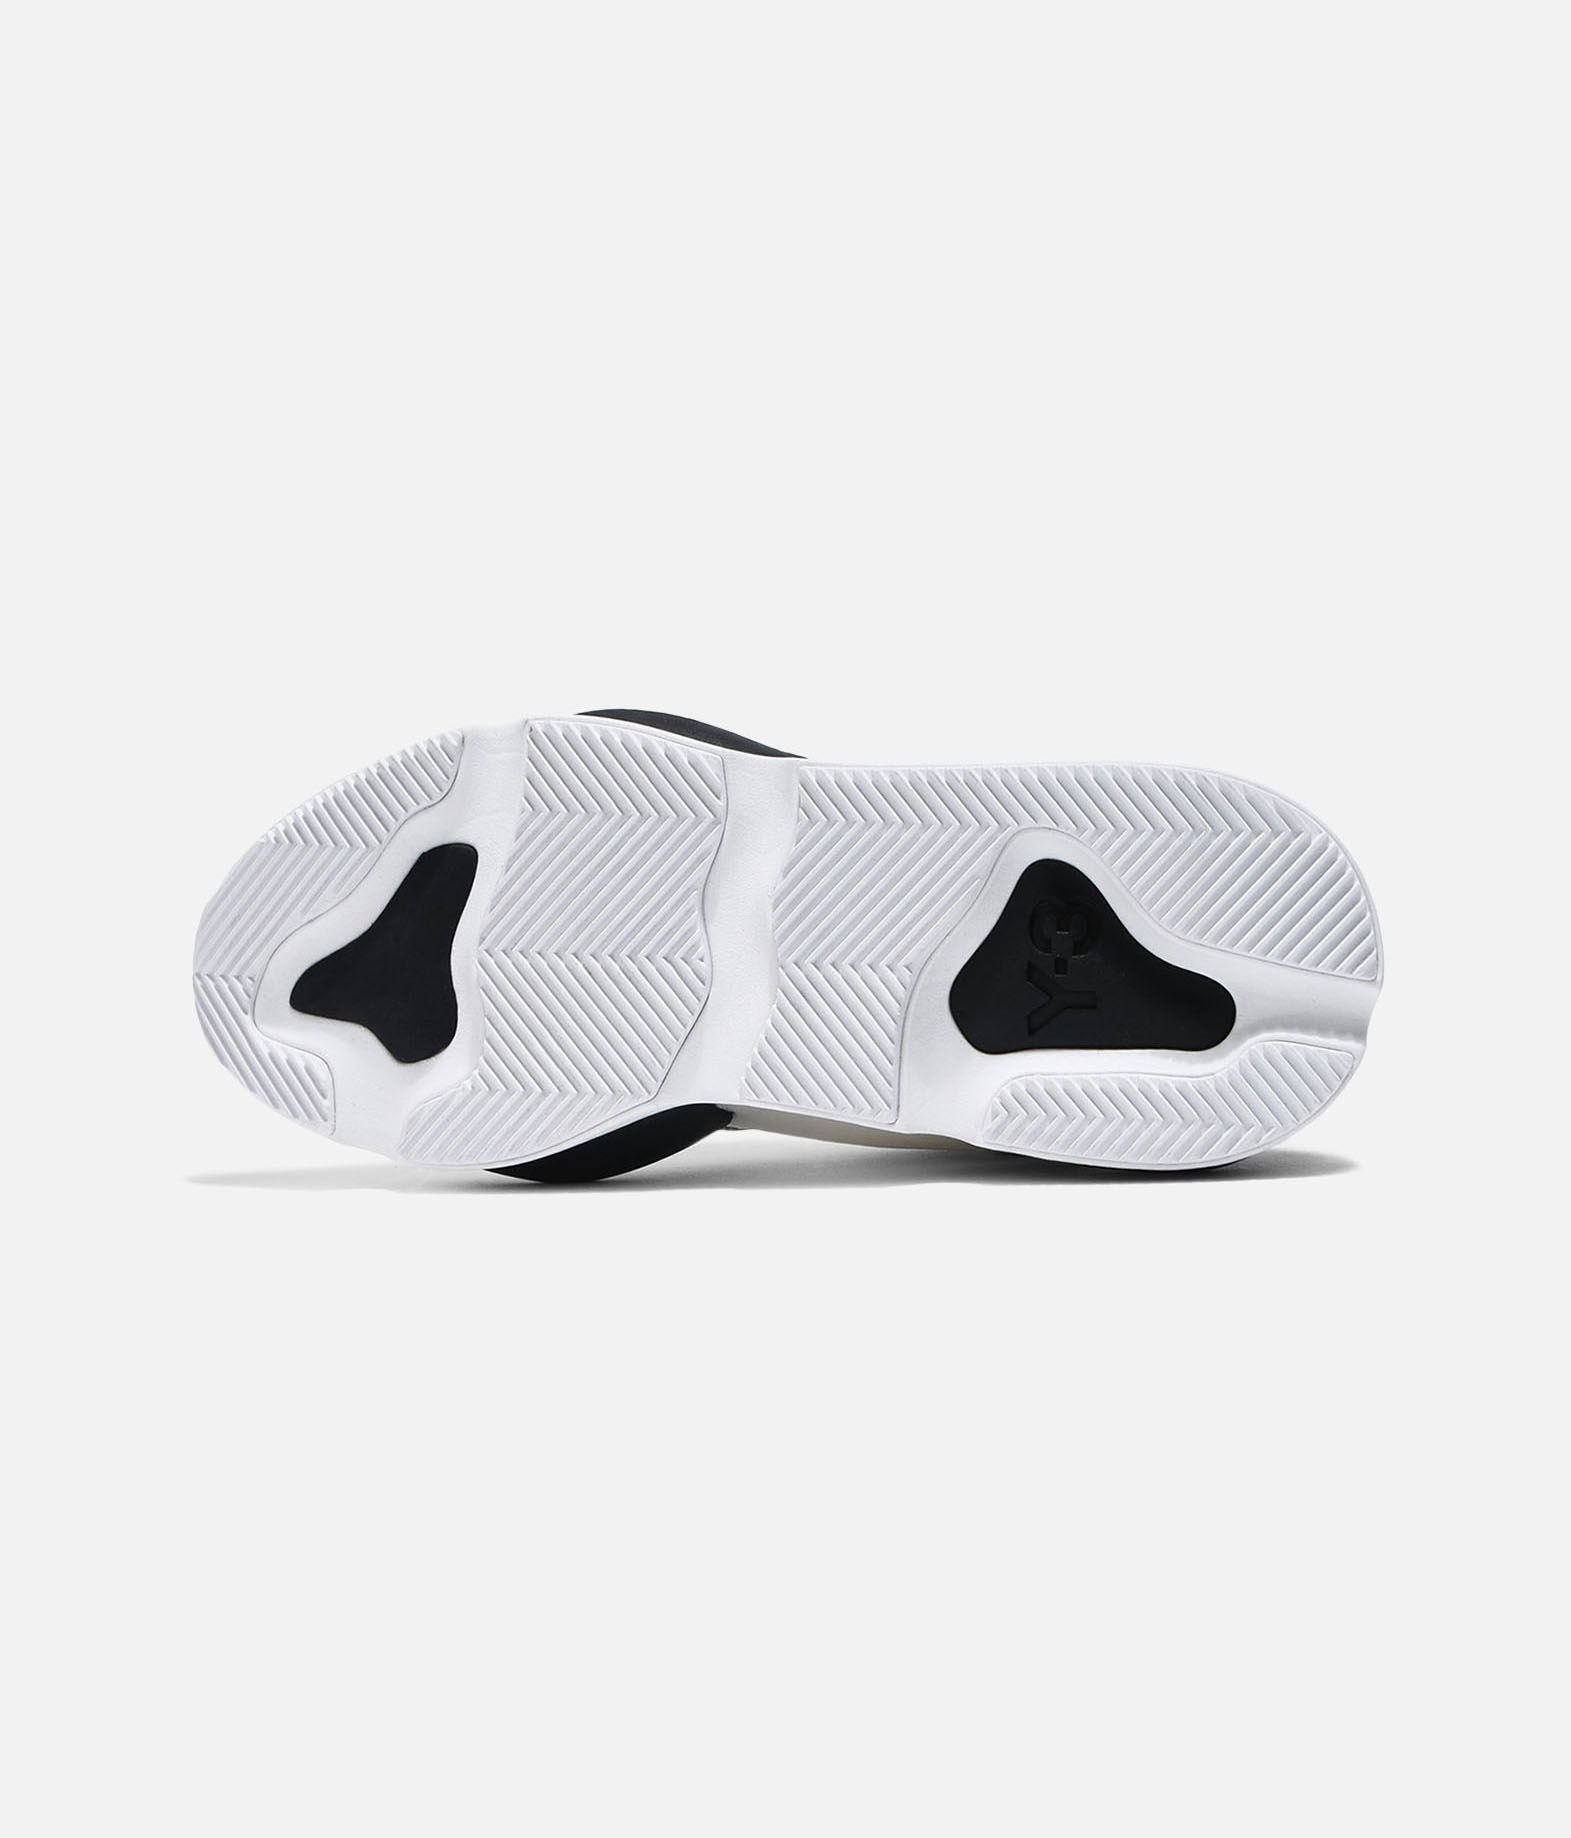 Y-3 Y-3 Kaiwa Sneakers E a